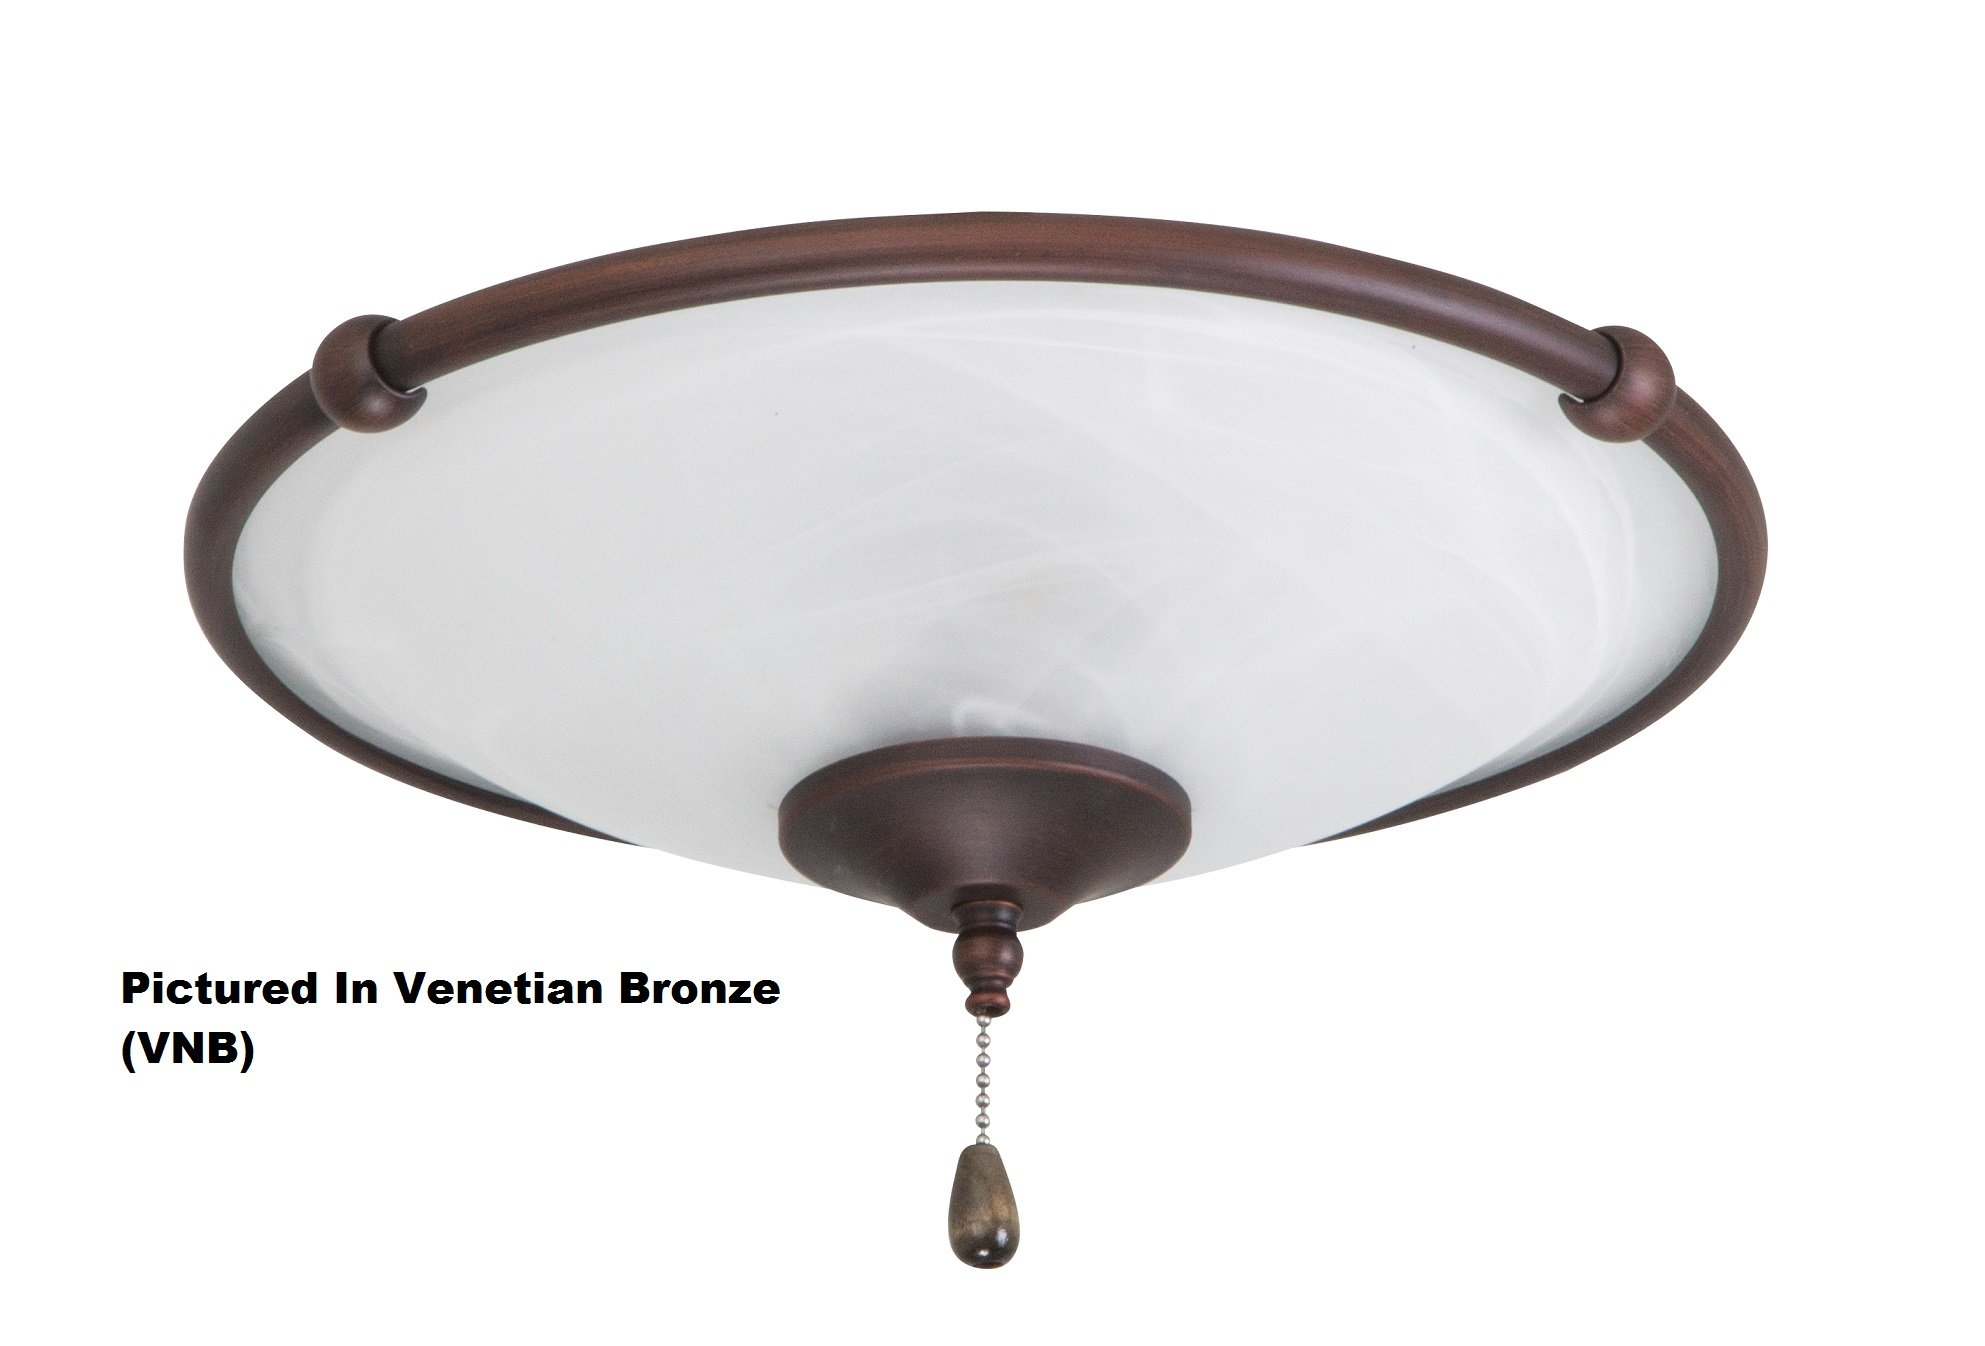 Emerson Ceiling Fan Light Fixtures LK53GBZ Low Profile Light Fixture, Gilded Bronze Ceiling Lamp